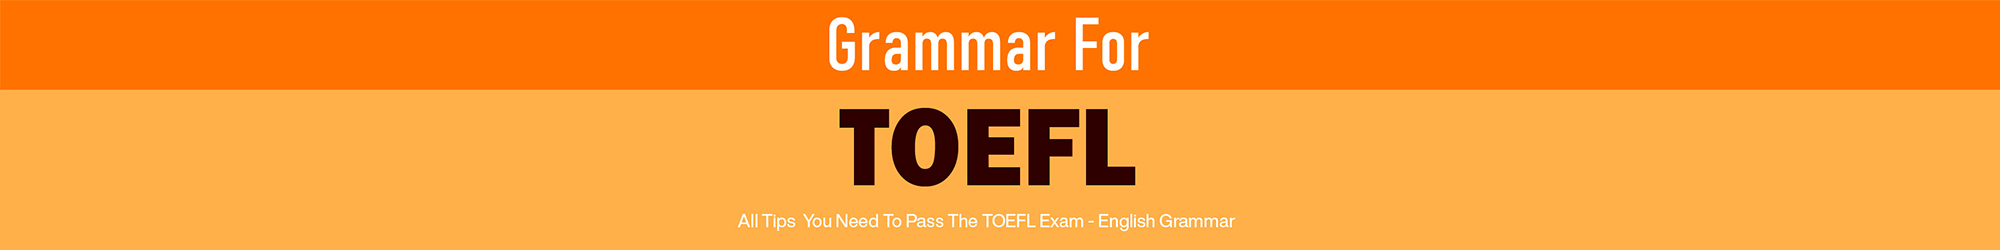 GRAMMAR FOR TOEFL TEST banner